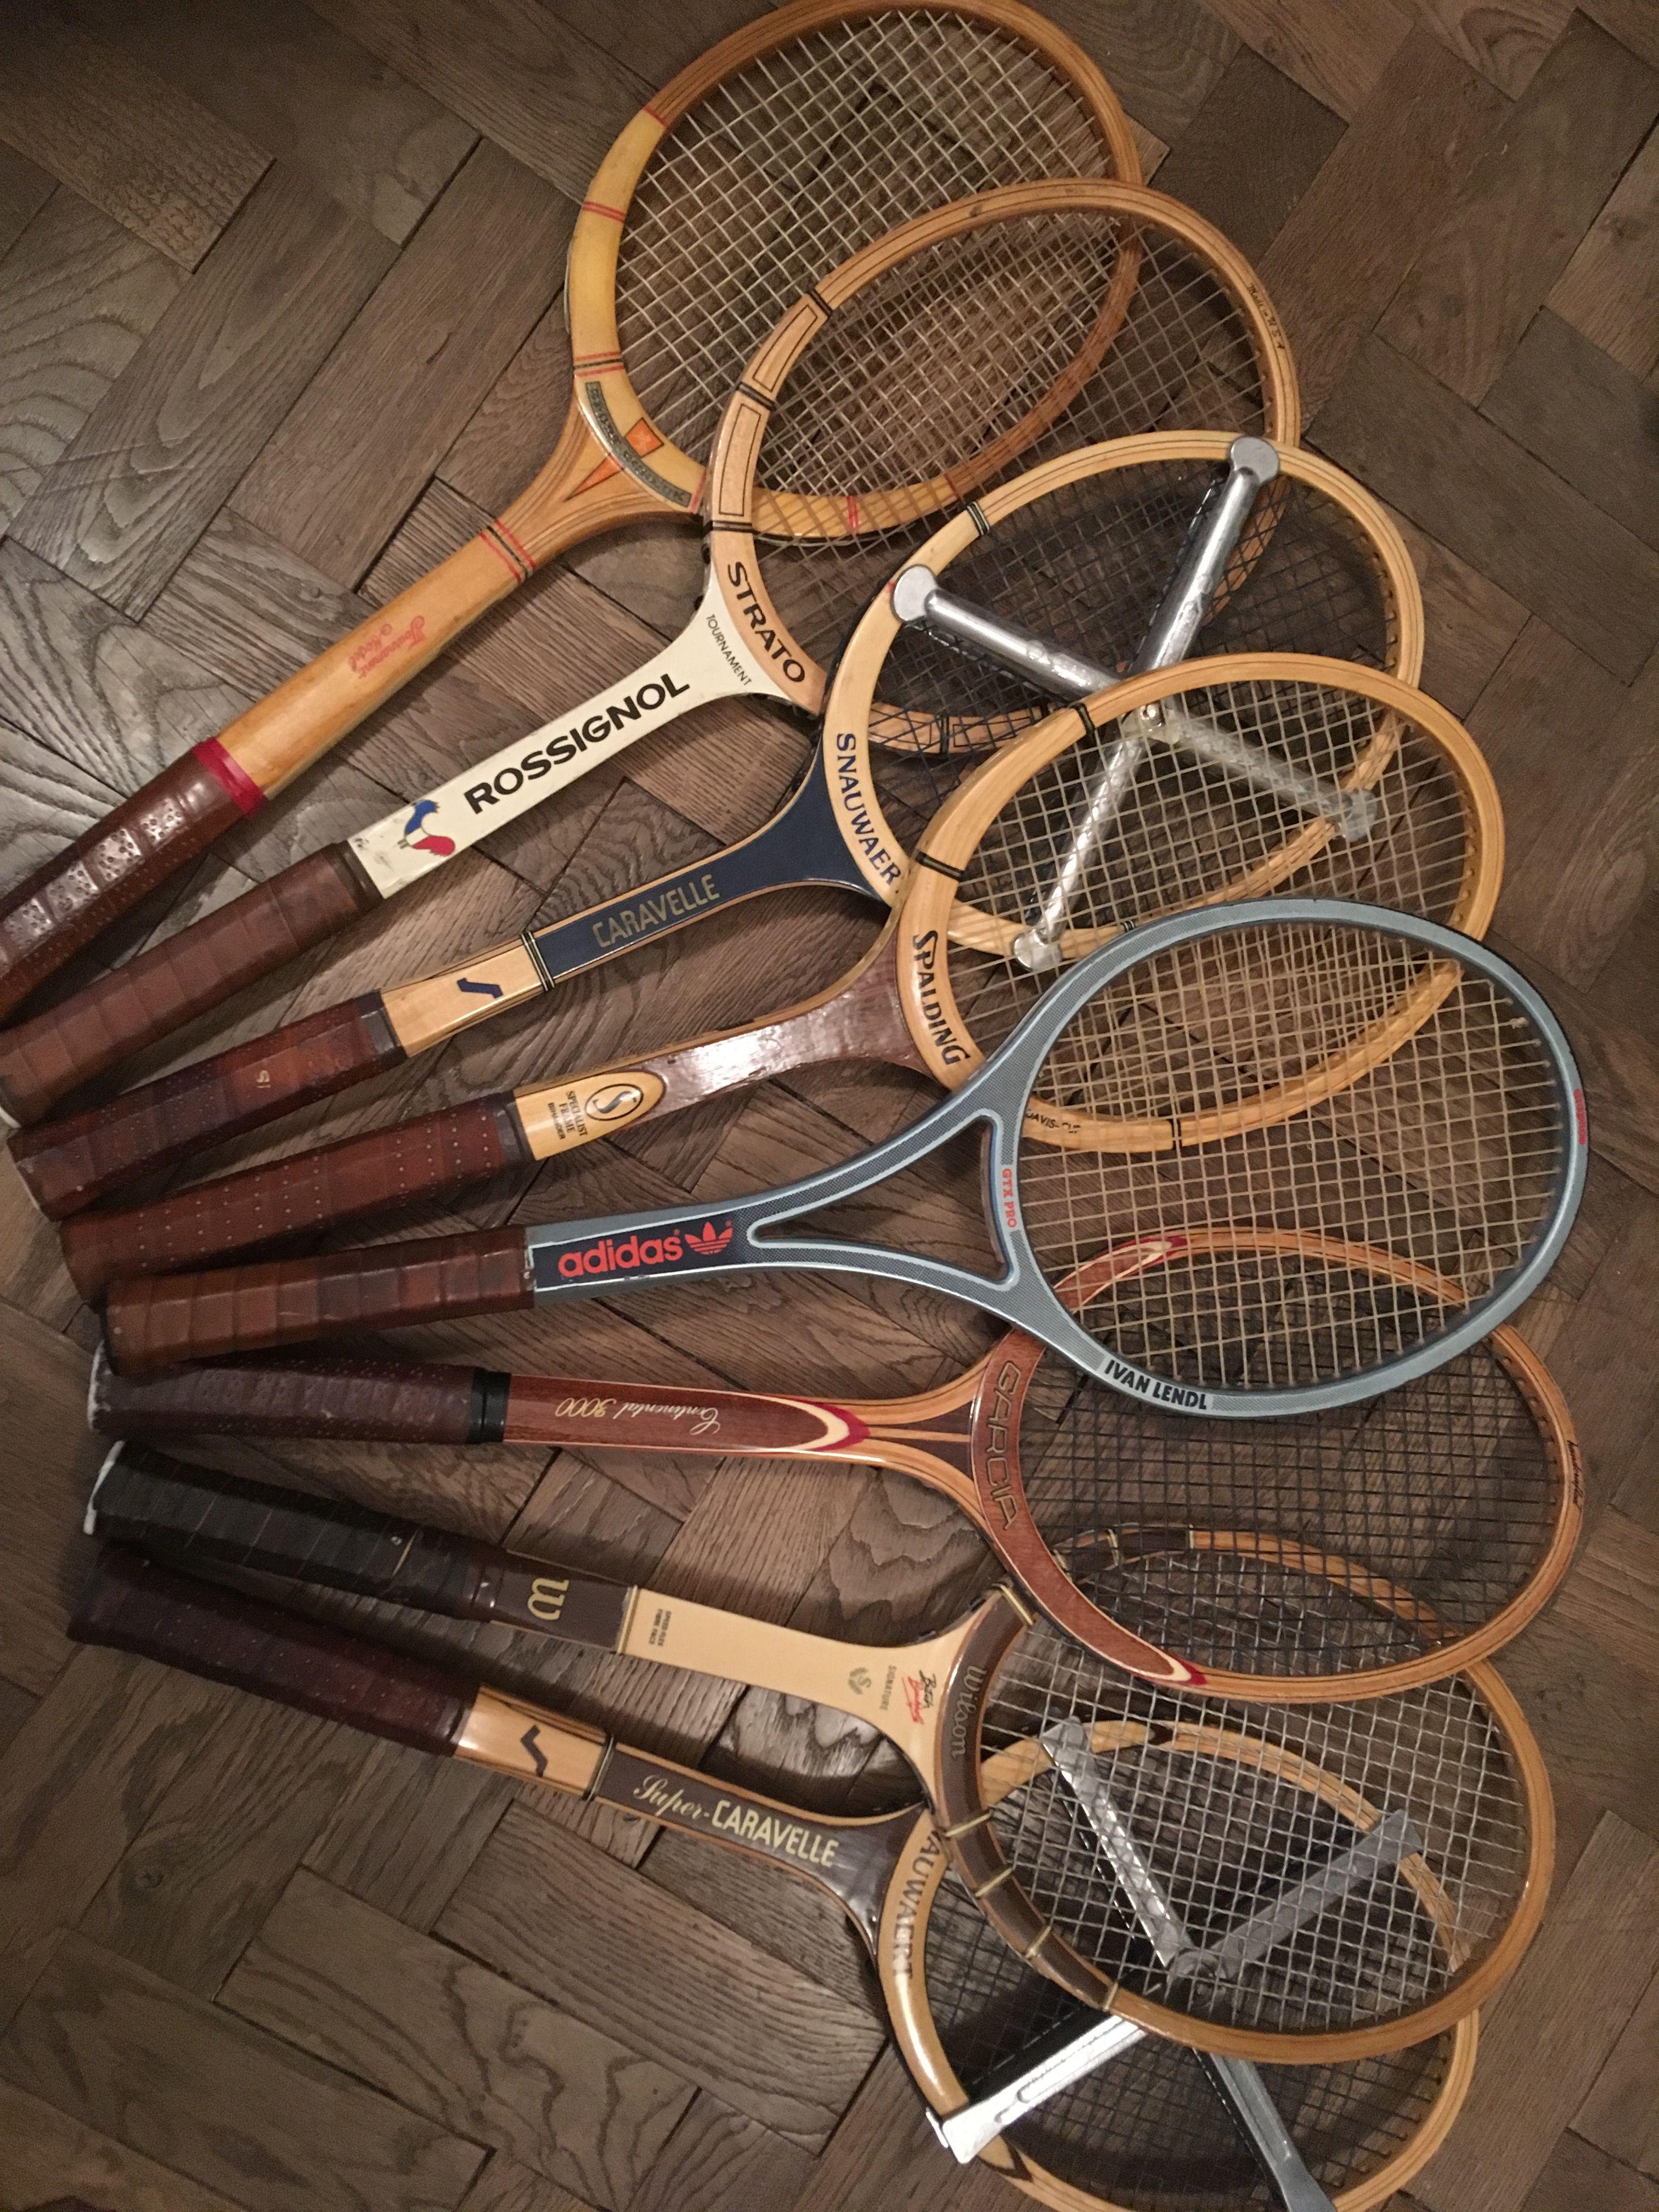 Pin By Scallywag4eva1 On Tennis Tennis Vintage Tennis Tennis Racket